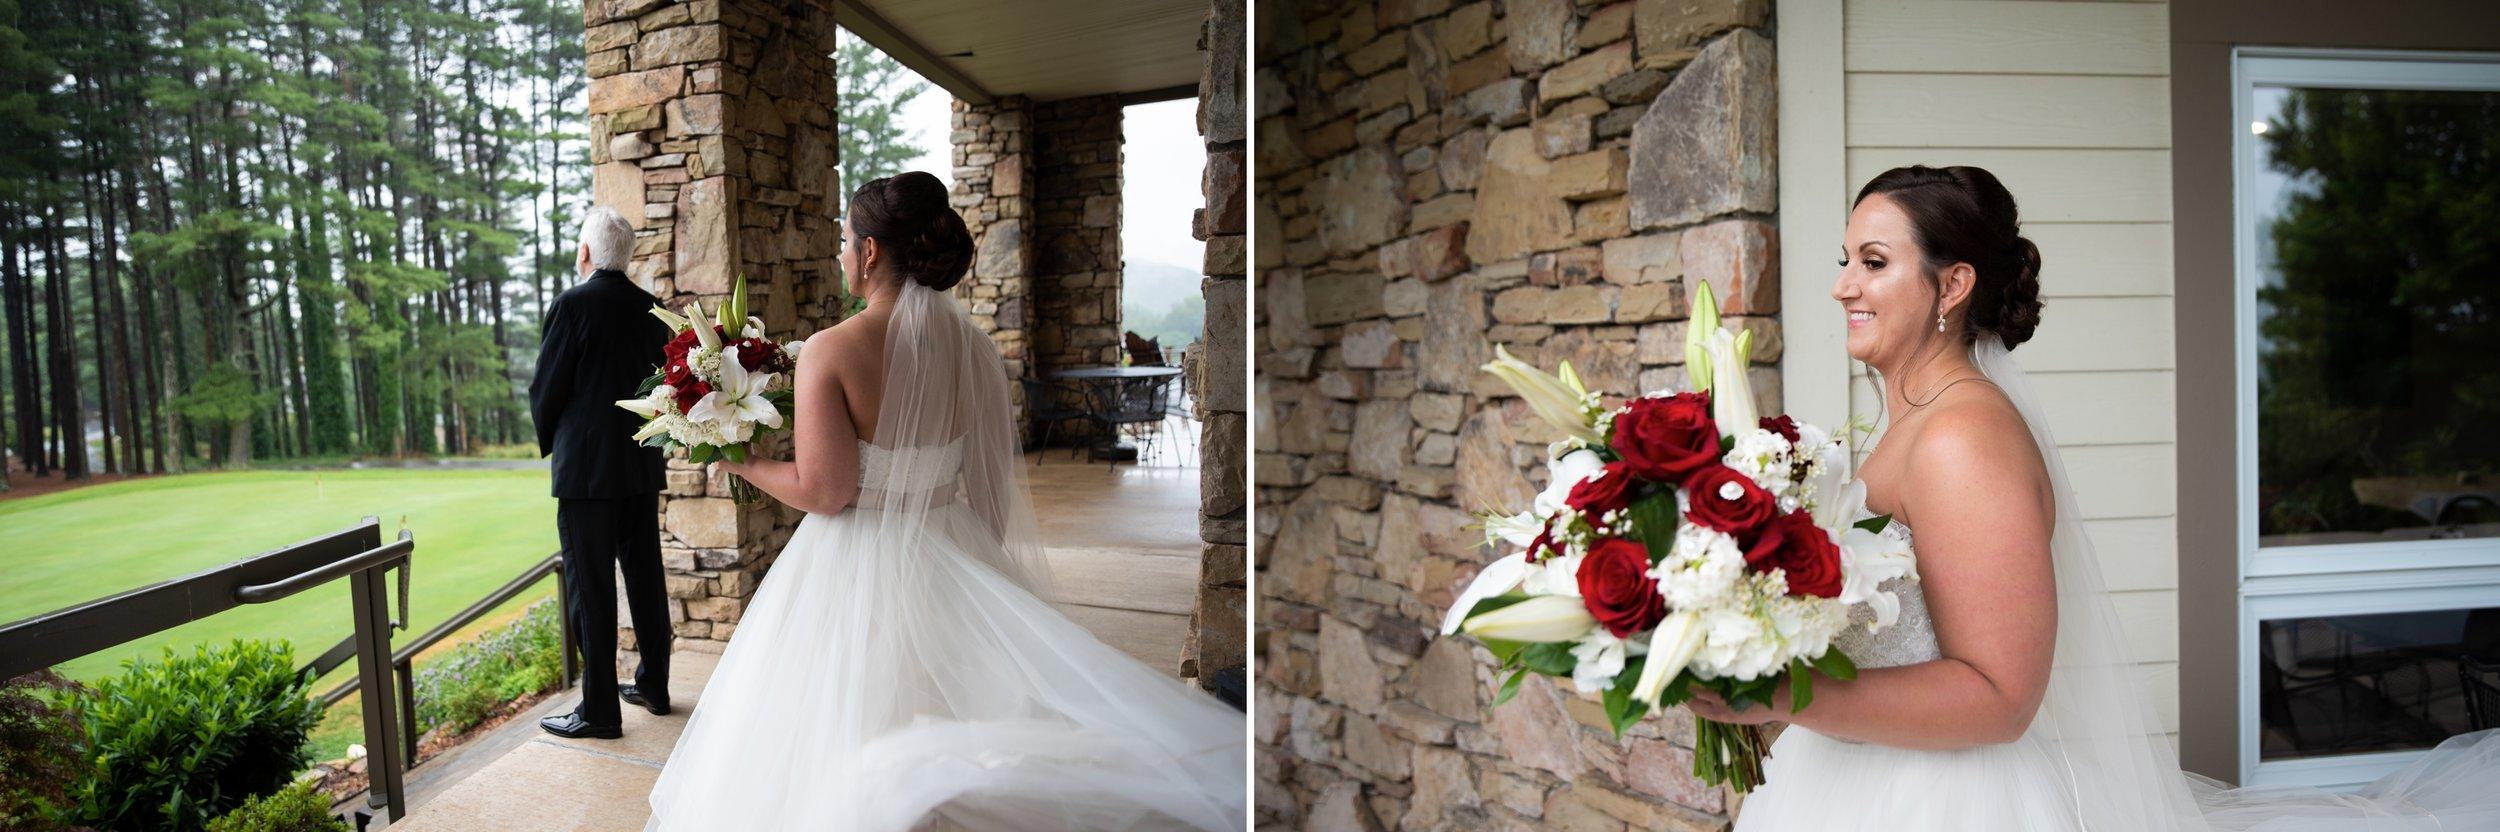 High Vista Wedding - Asheville Vendors  31.jpg